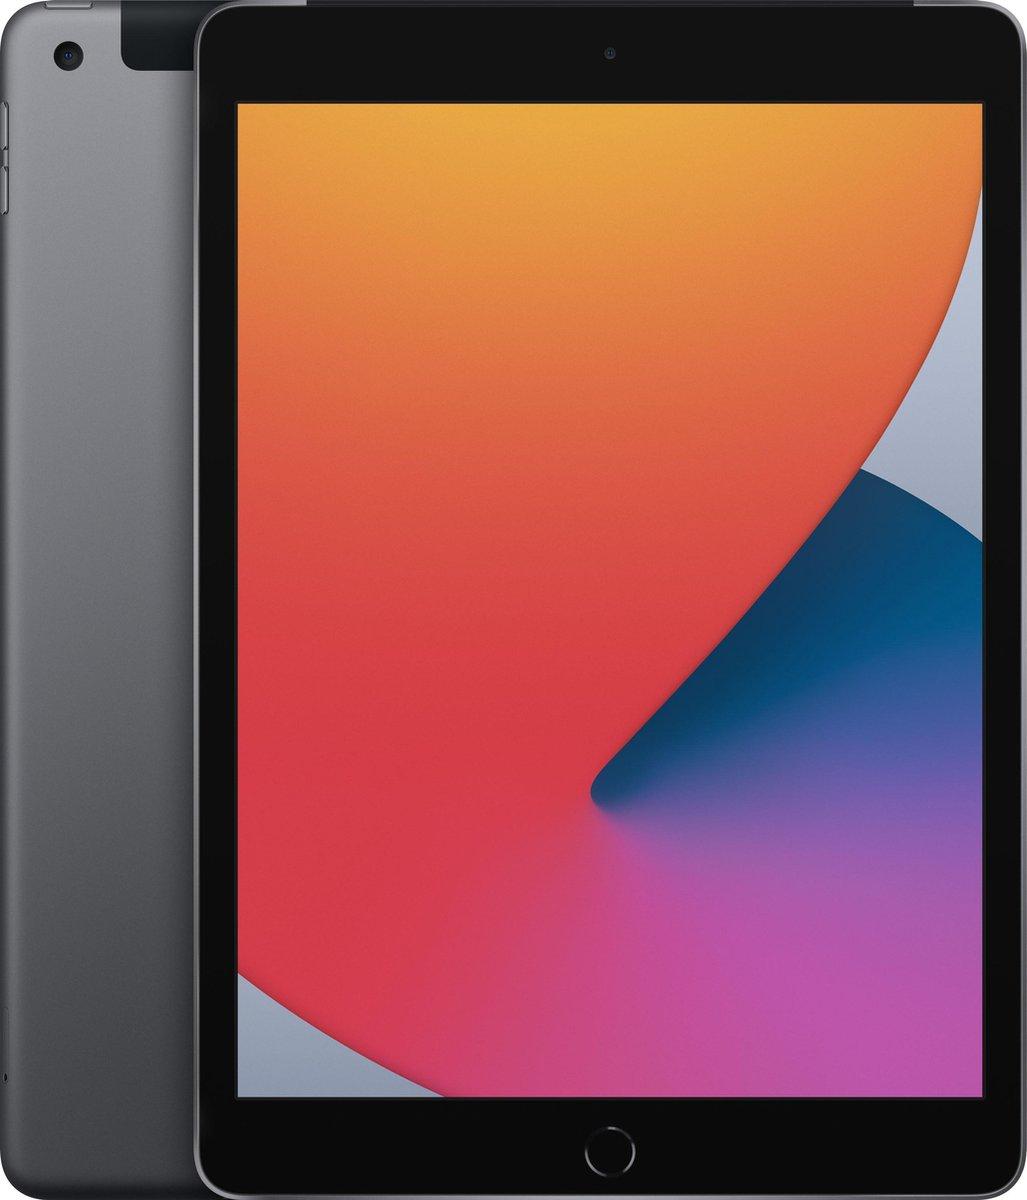 Apple iPad (2020) – 10.2 inch – WiFi + 4G – 32GB – Spacegrijs